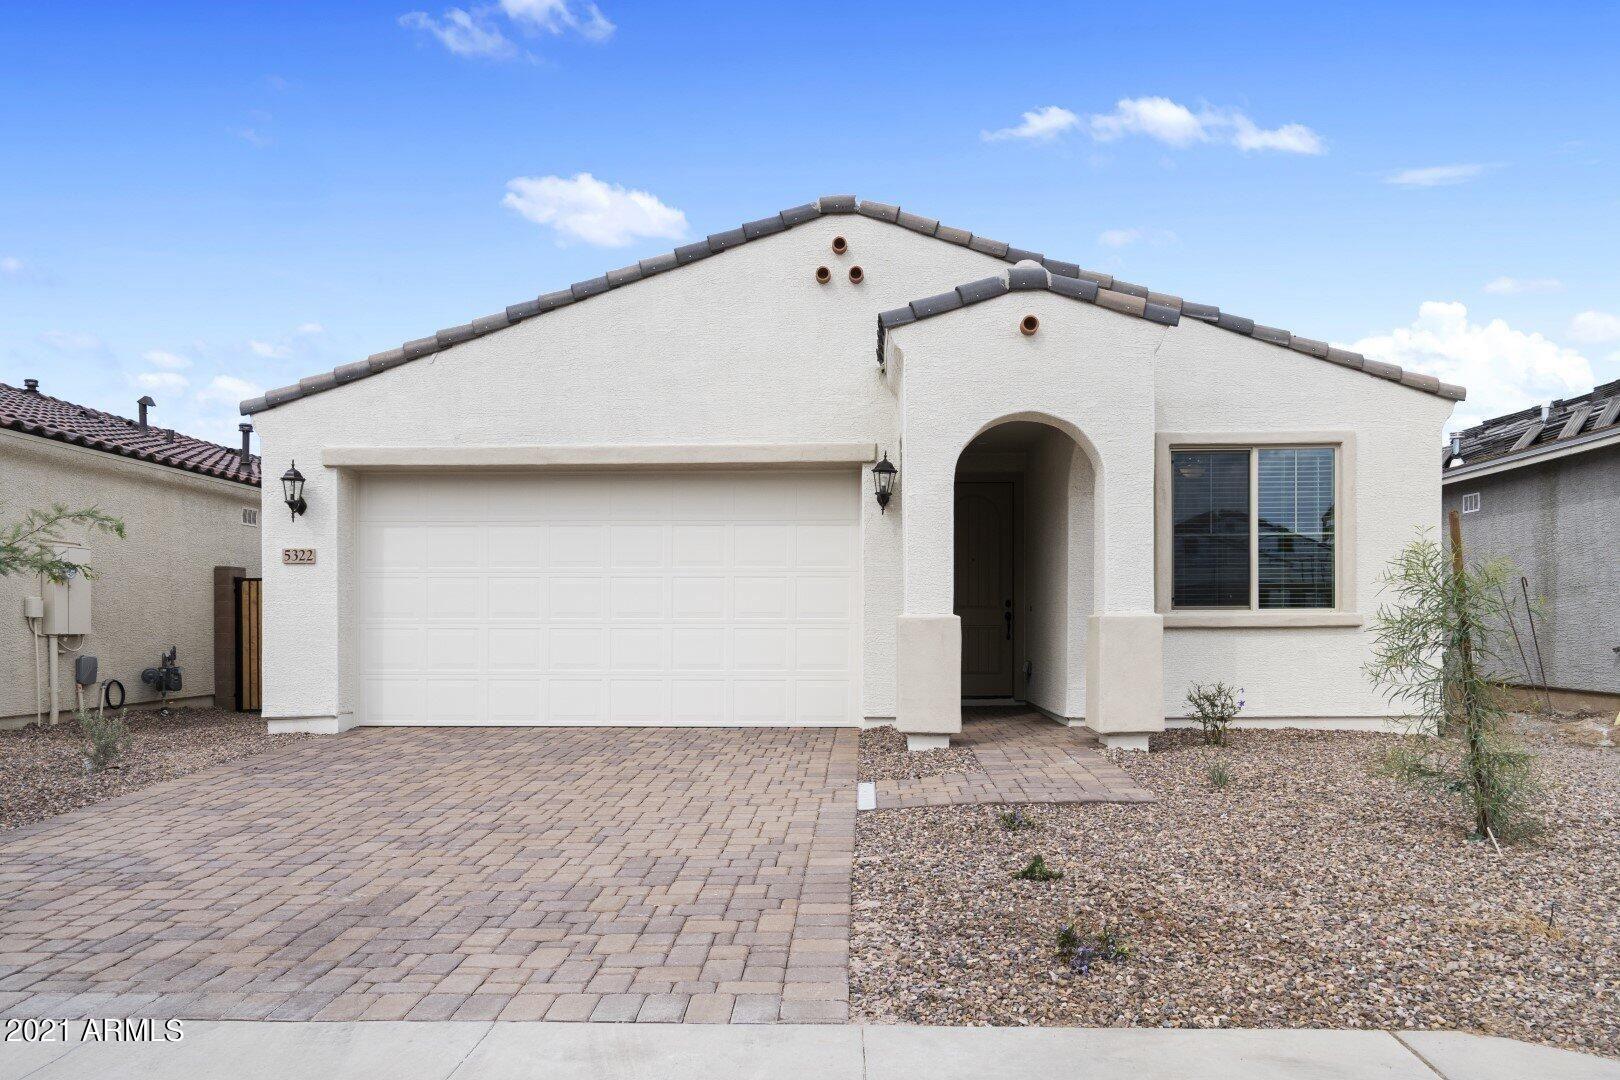 Photo of 5322 W CHUCK BOX Road, Laveen, AZ 85339 (MLS # 6307401)